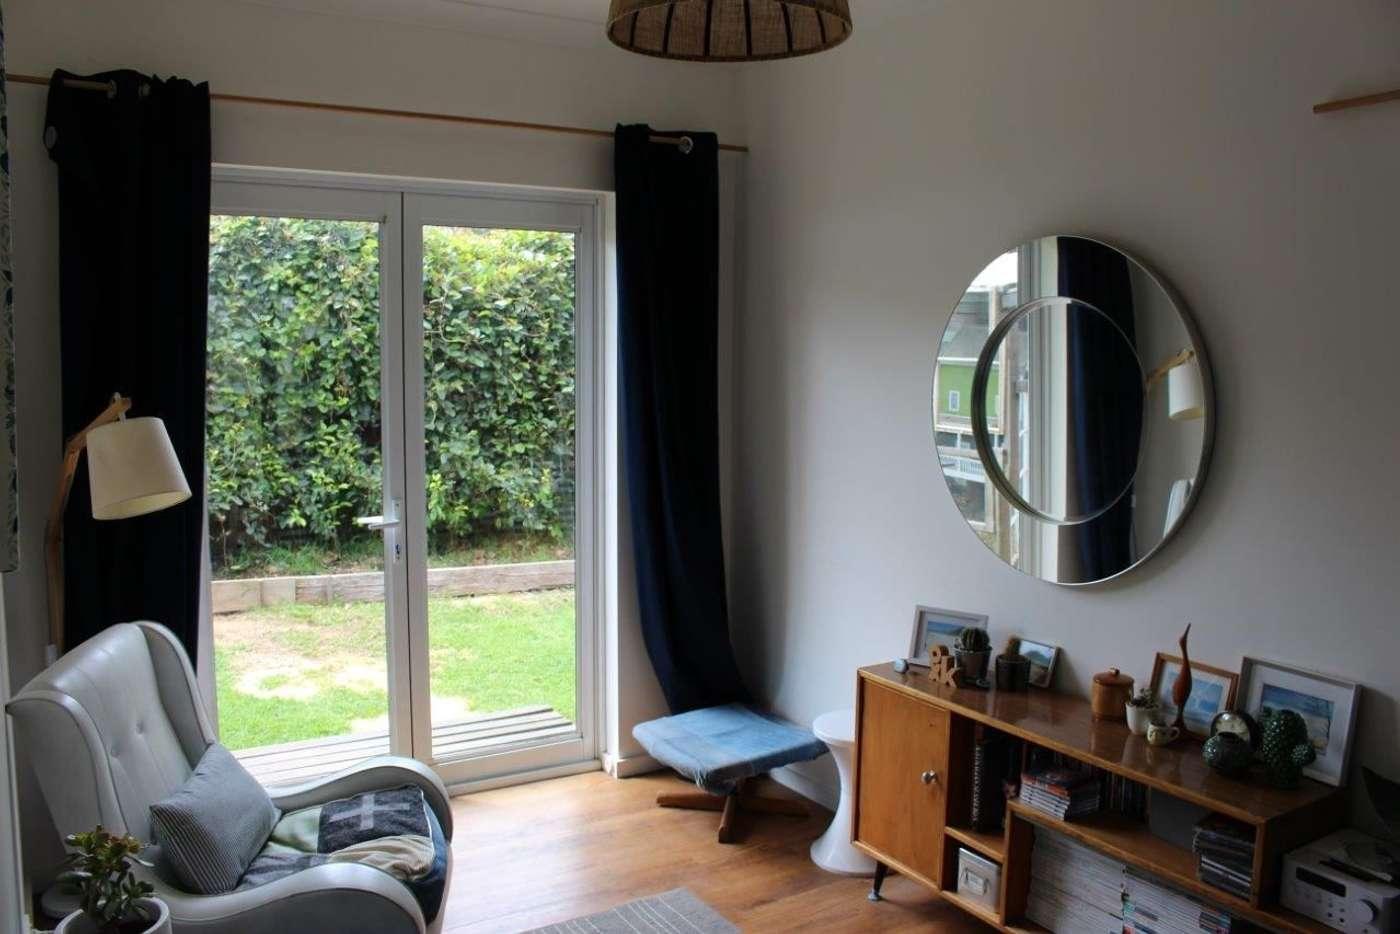 Sixth view of Homely house listing, 6/8 Ti Tree Lane, Denmark WA 6333